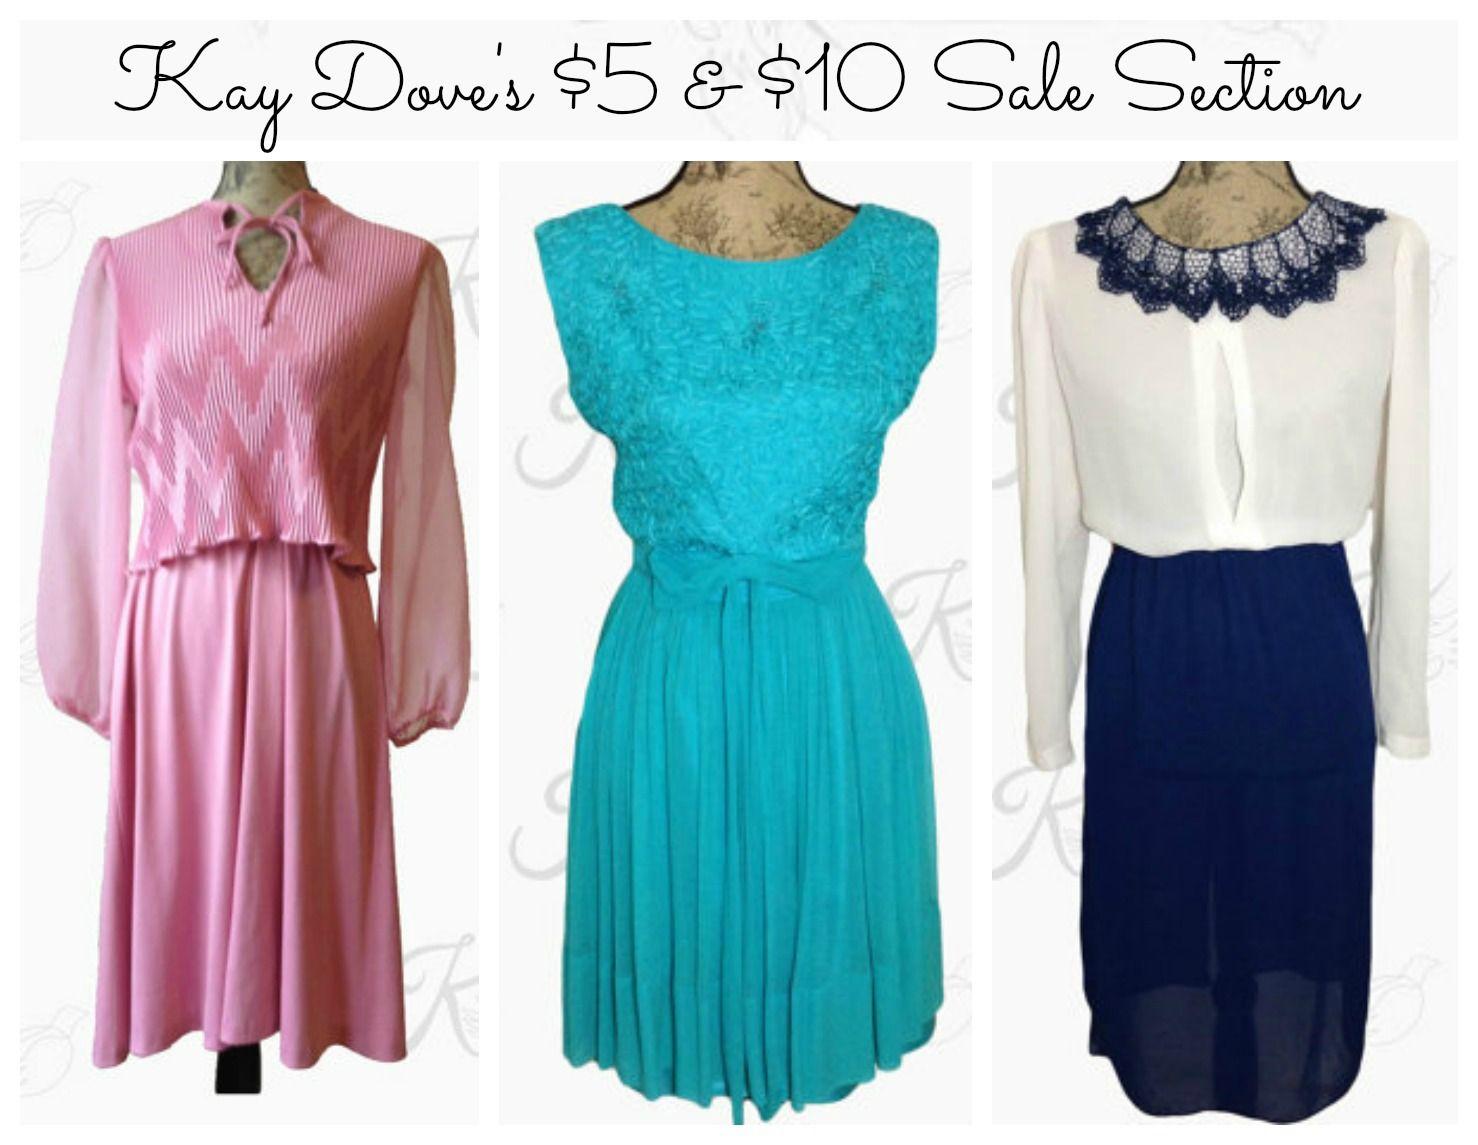 #vintage #fashion #sale #shop #dress #sweater #summer #sundress #50sstyle #fifties #50sfashion #1950s #etsy @Etsy